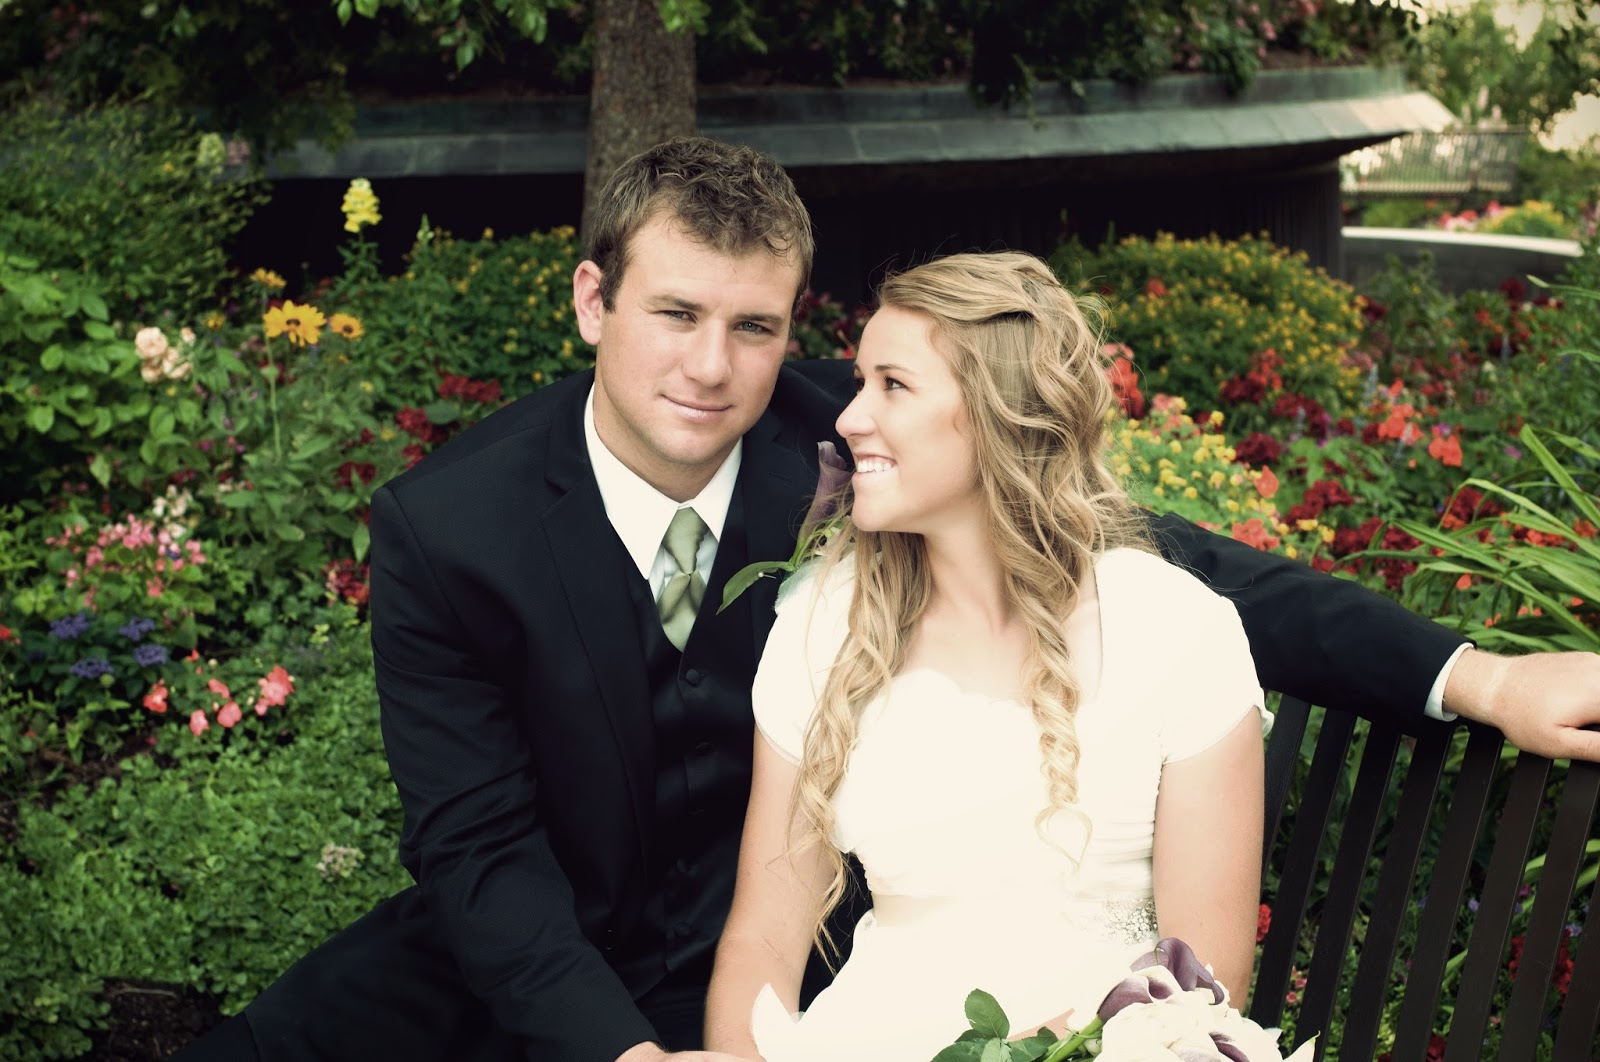 Mitch and megan wedding